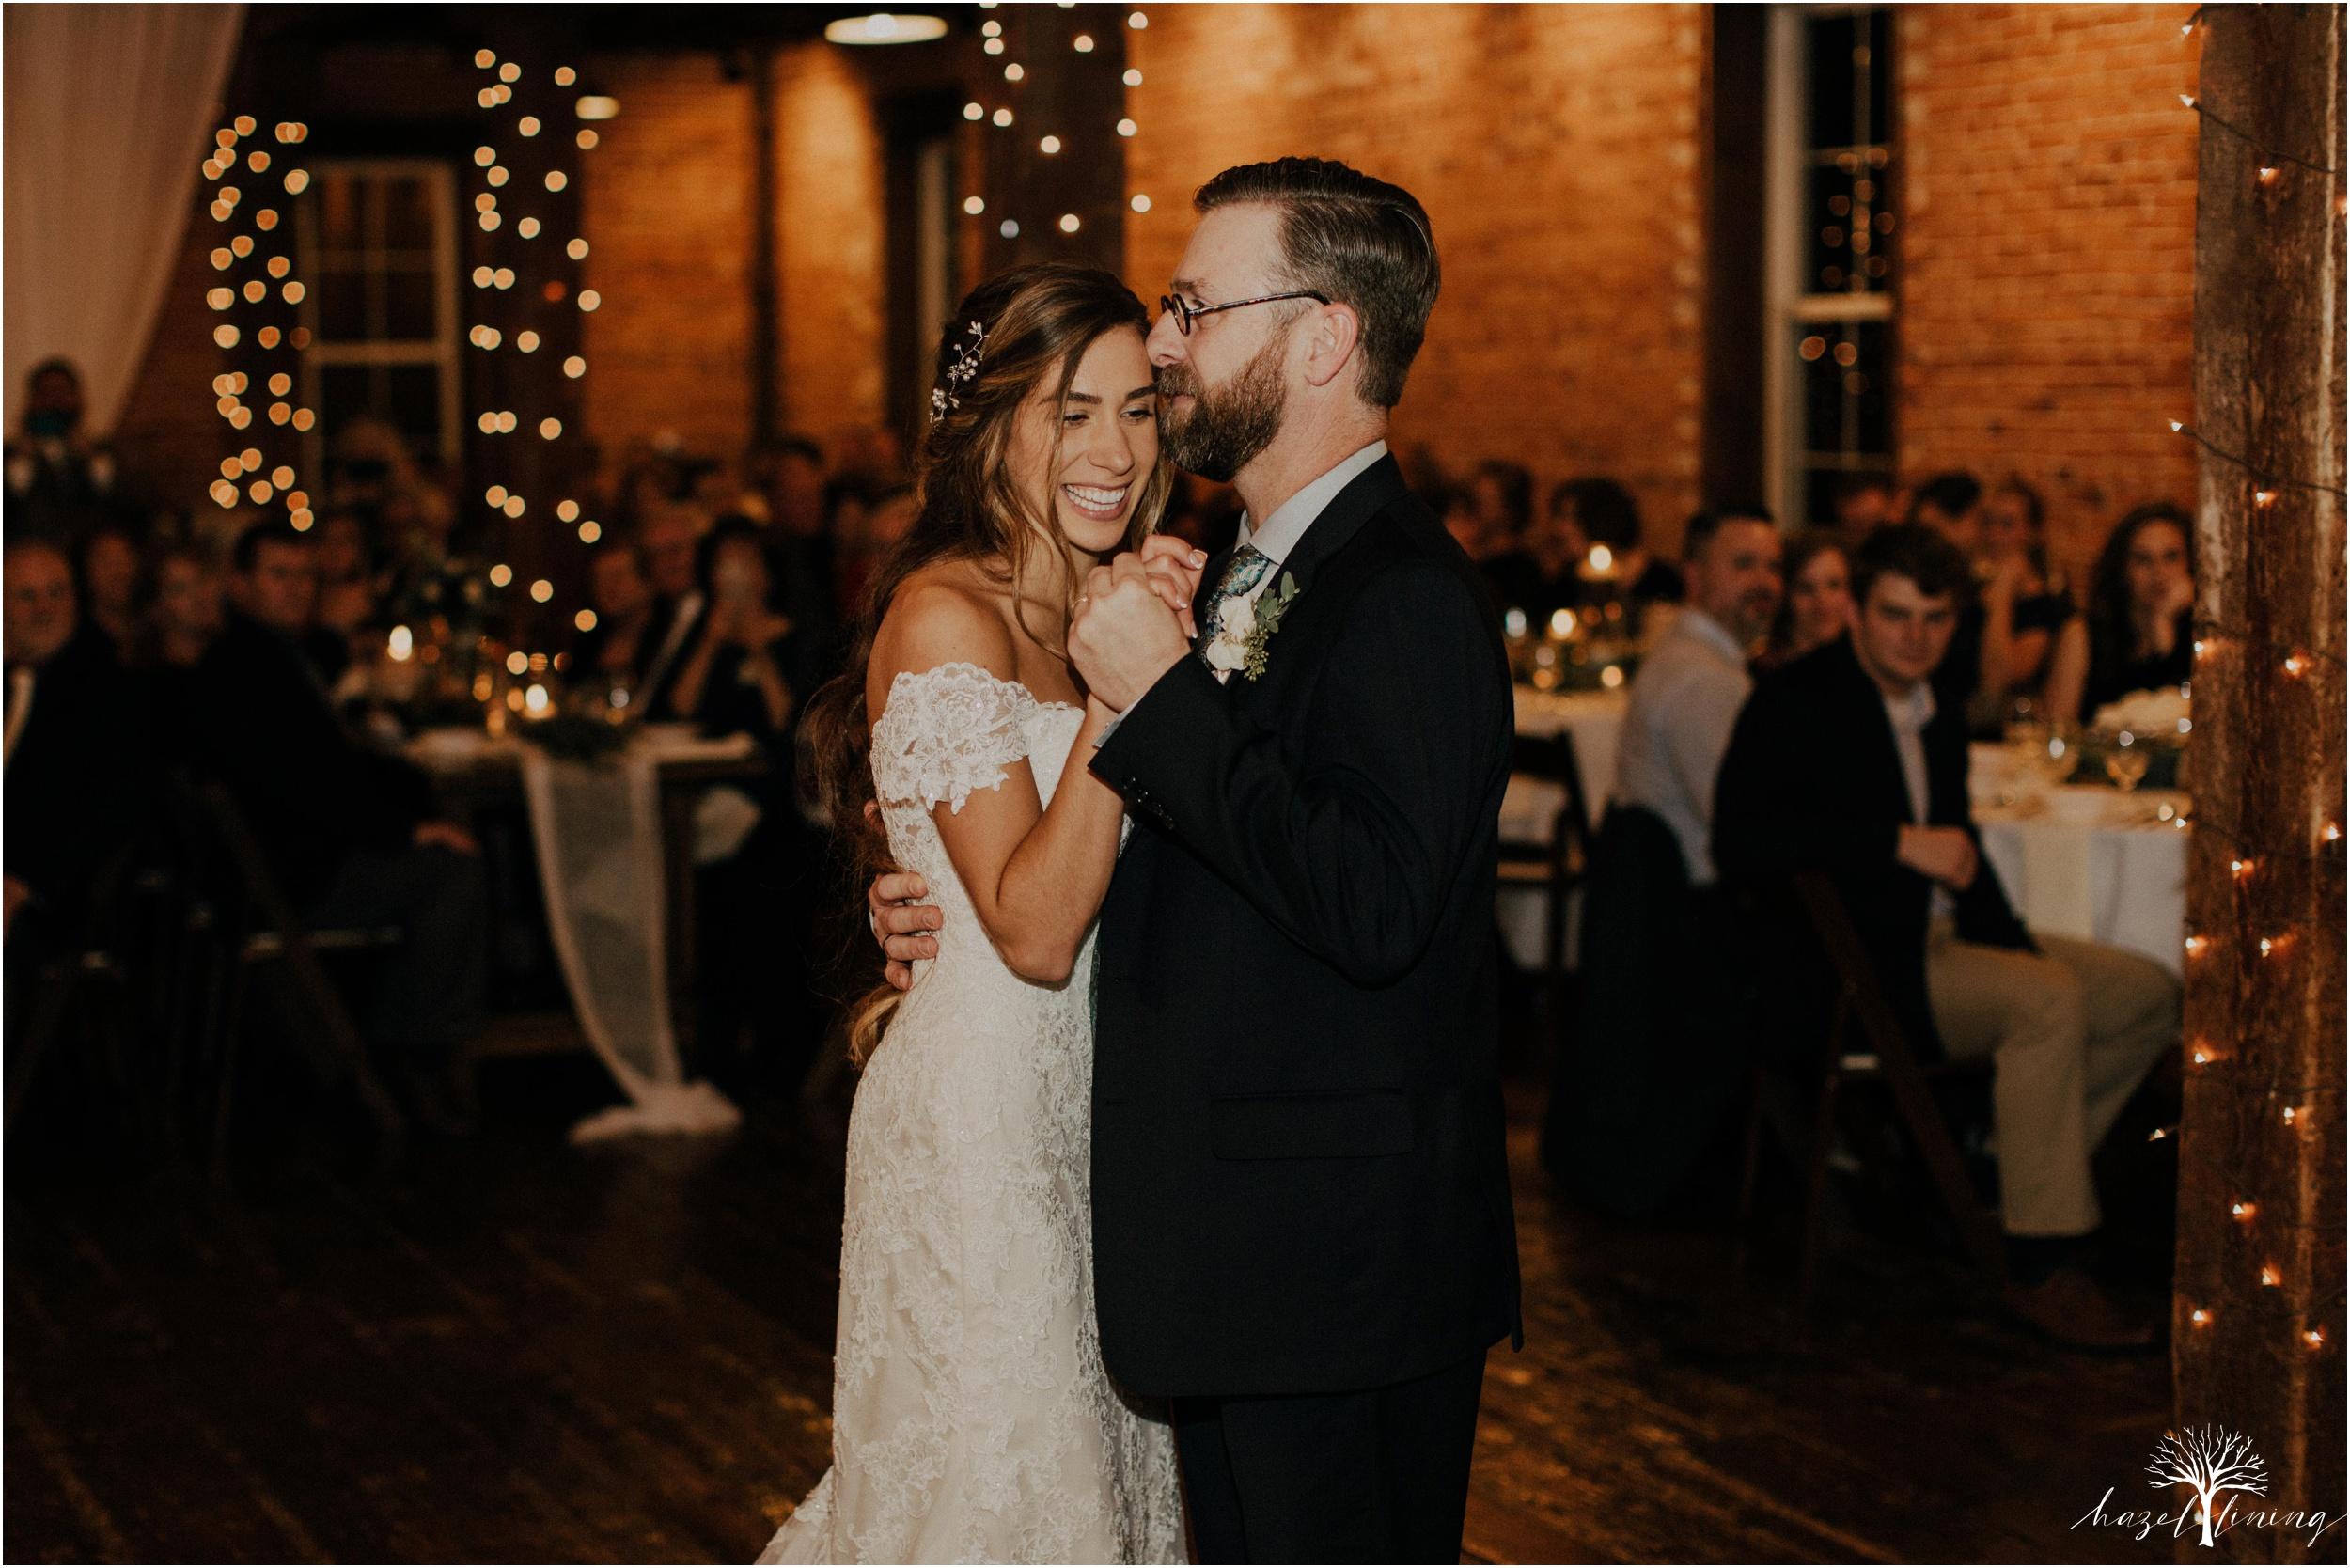 emma-matt-gehringer-the-booking-house-lancaster-manhiem-pennsylvania-winter-wedding_0151.jpg